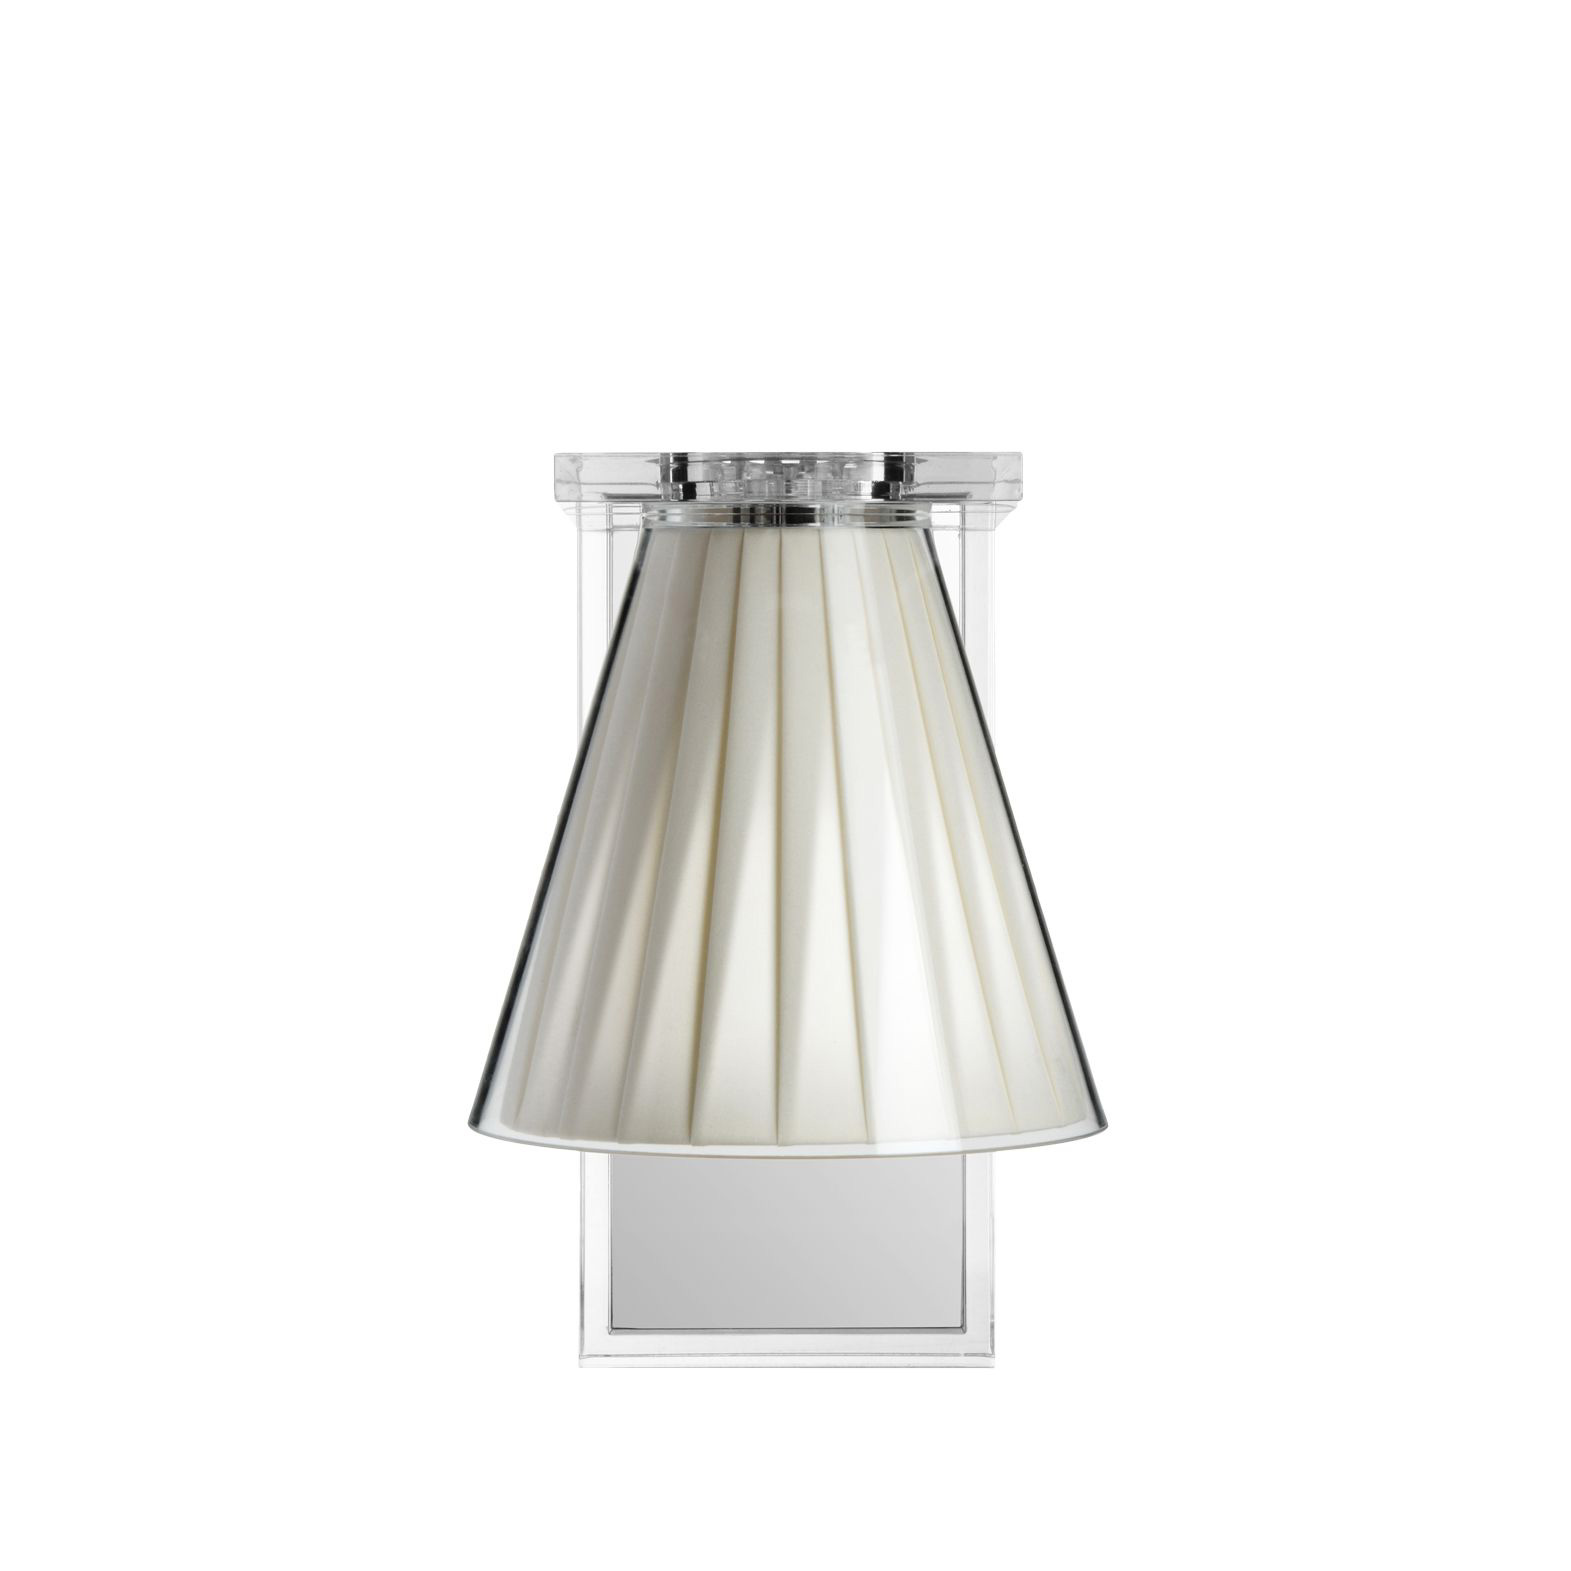 Contemporary wall lights modern designer wall lighting kartell light air wall lamp aloadofball Image collections